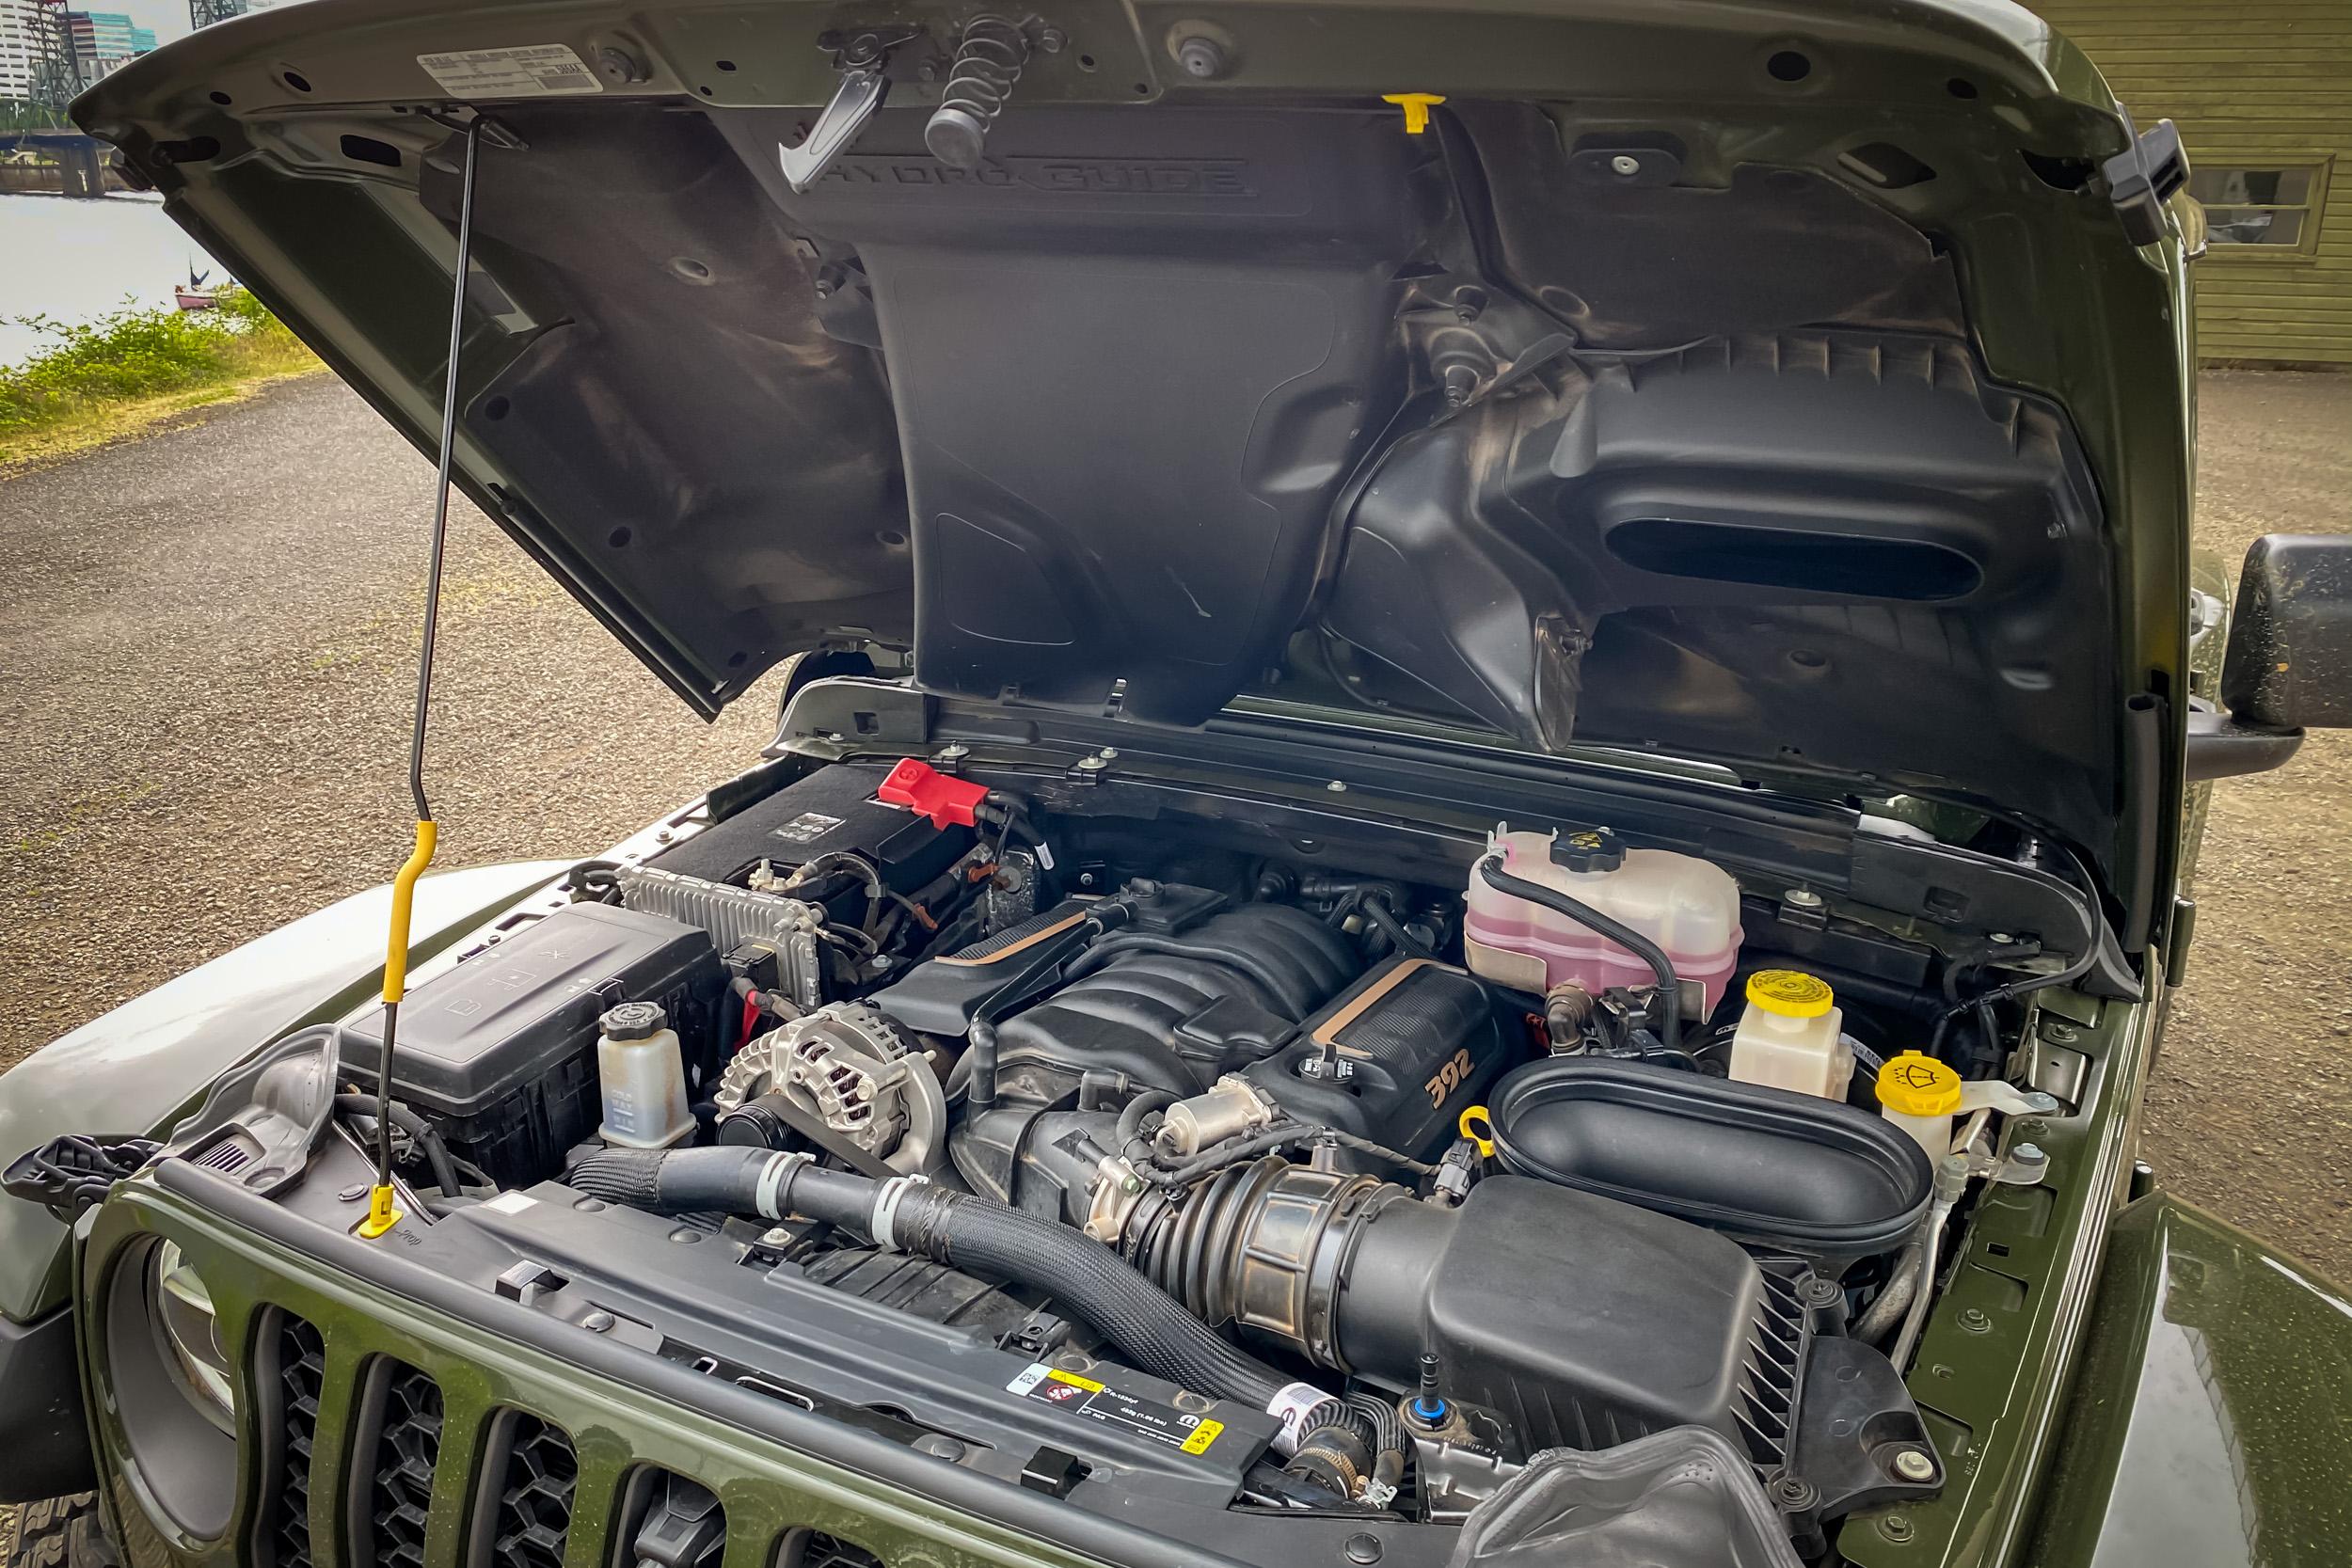 2021 Jeep Wrangler Rubicon 392 Hemi engine